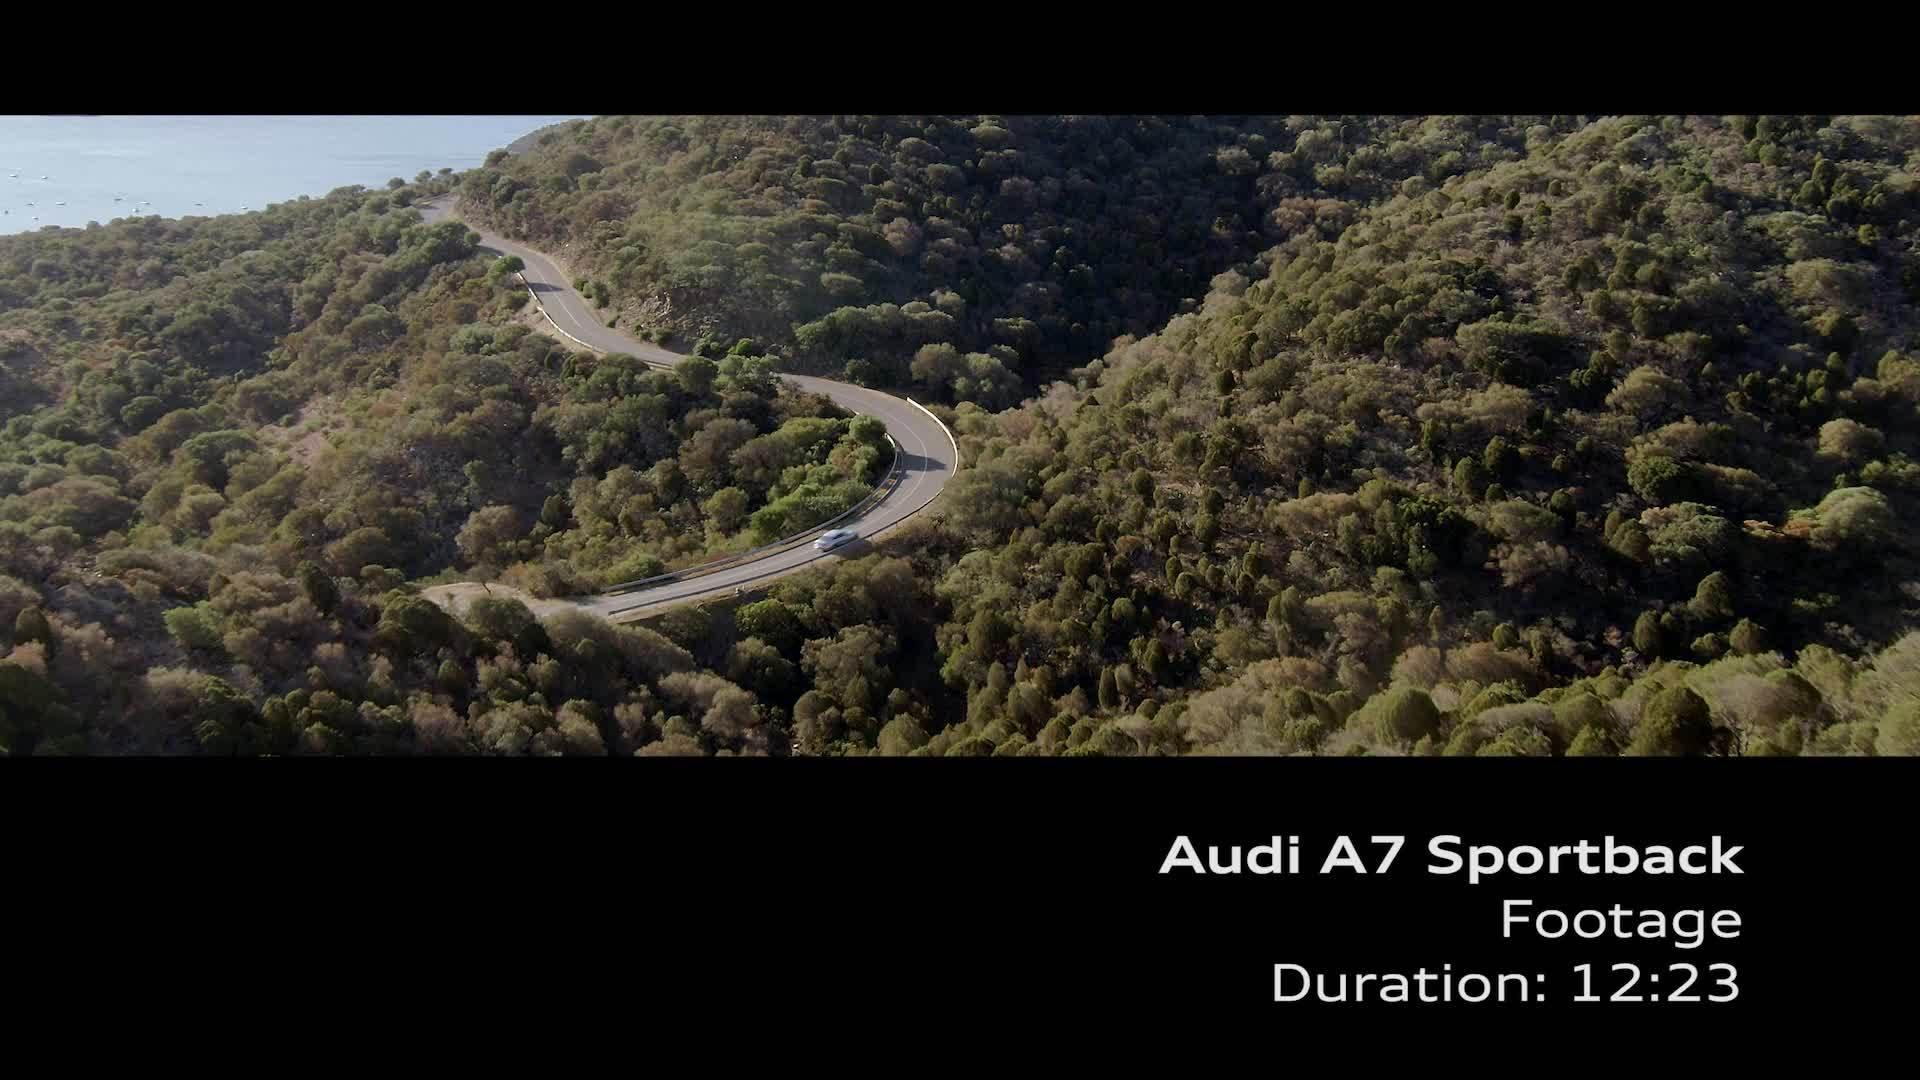 Audi A7 Sportback Footage grau